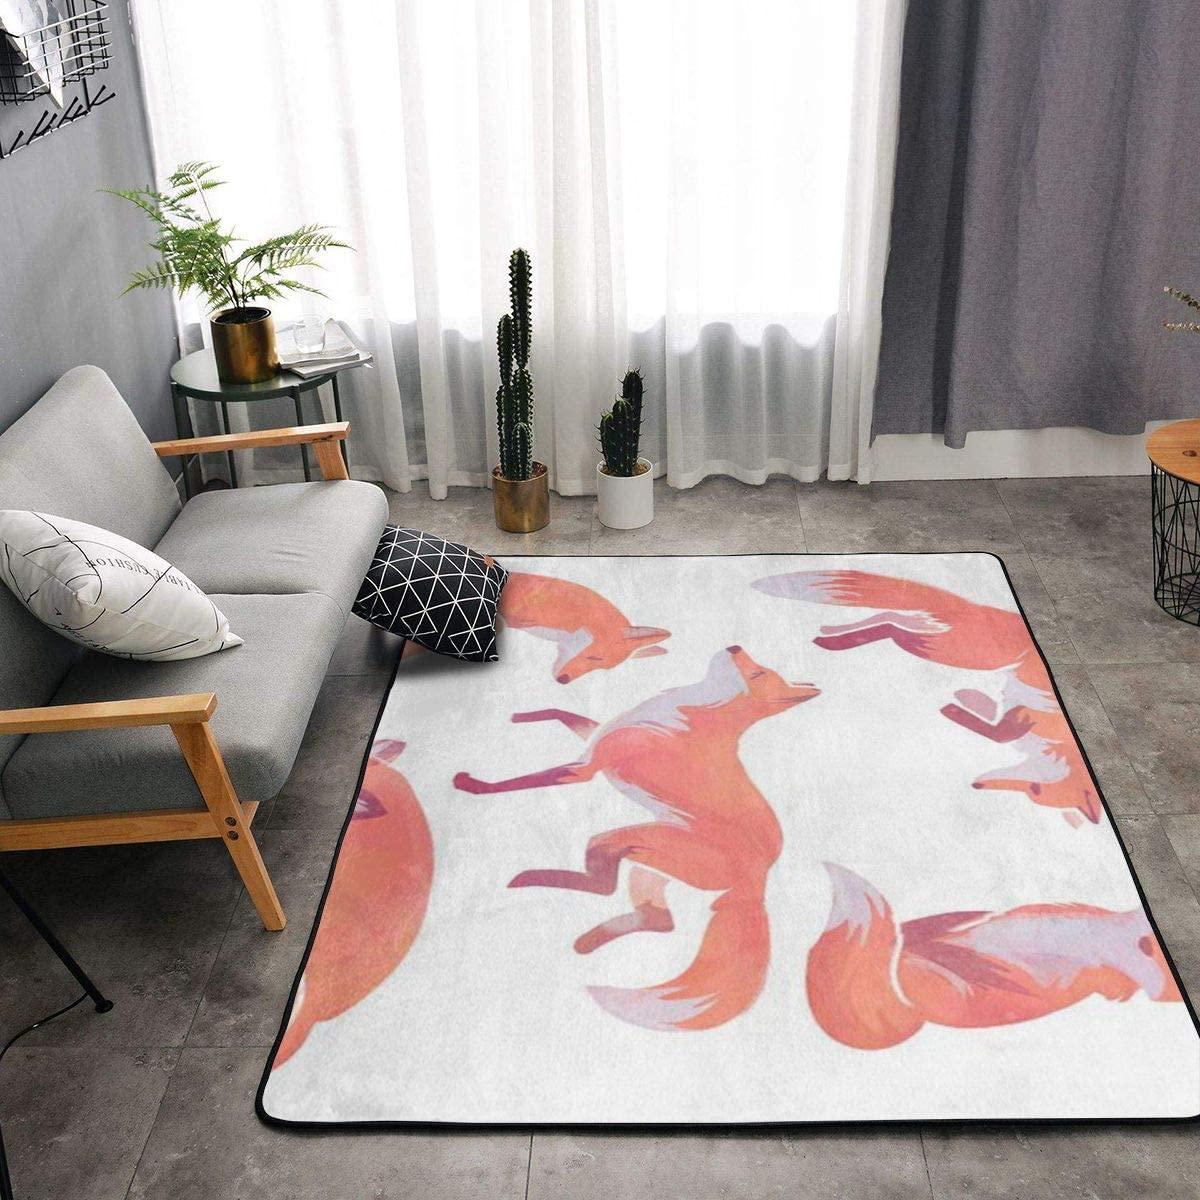 Area Rug Soft Fluffy Carpet for Bedroom Kids Teens Room, Modern Floor Mat Oversize Door Mat Plush Nursery Rugs for Boys Girls,Beautiful Fox,84x60 in